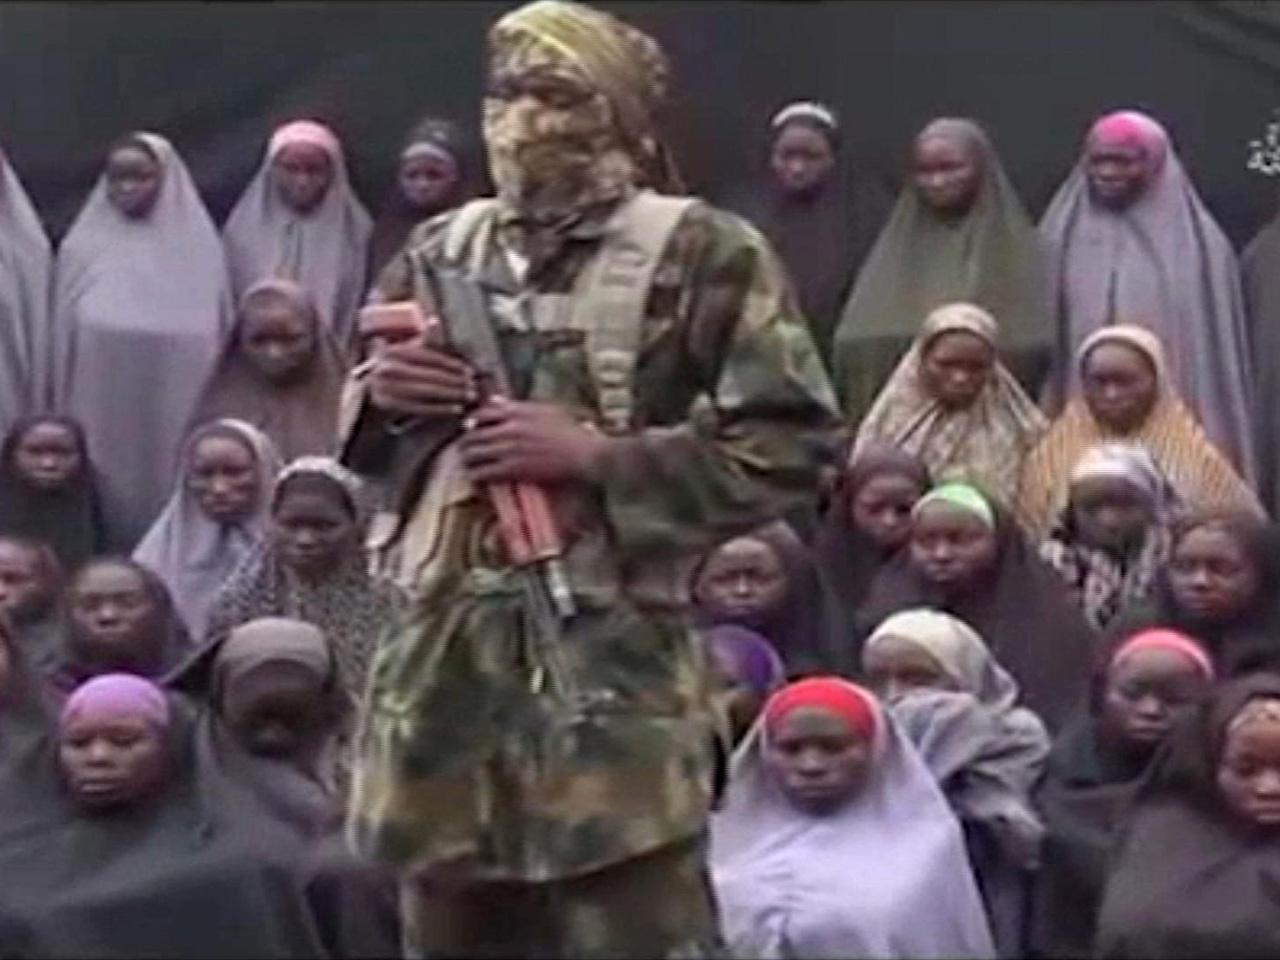 Islamic extremists storm village, kidnap women and children